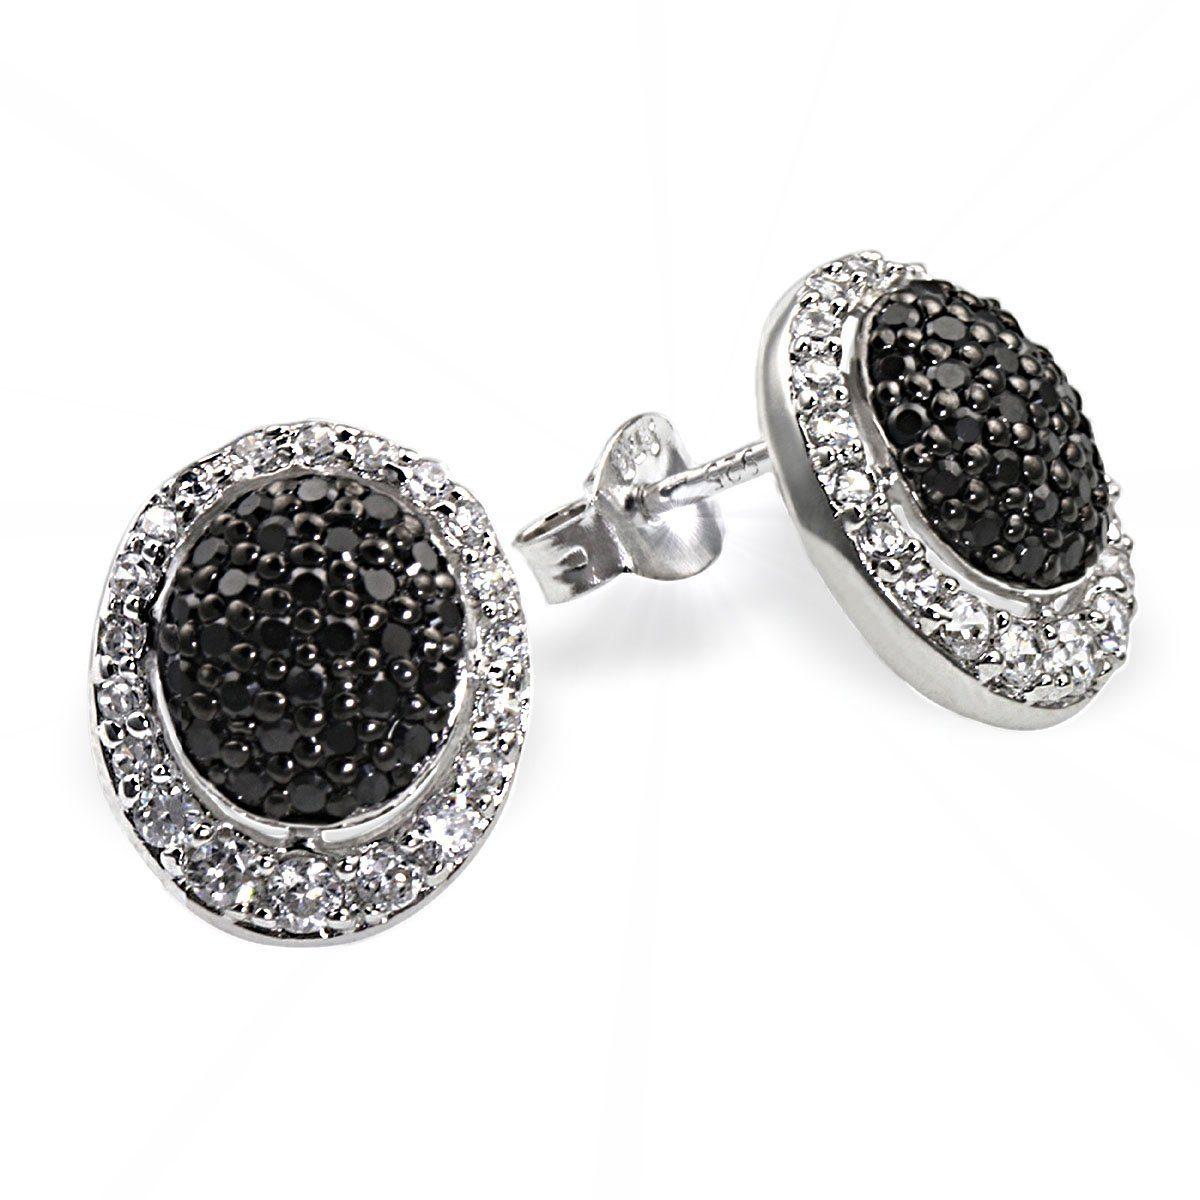 Averdin Paar Ohrstecker Silber 925 schwarz weisse Zirkonia Pavee